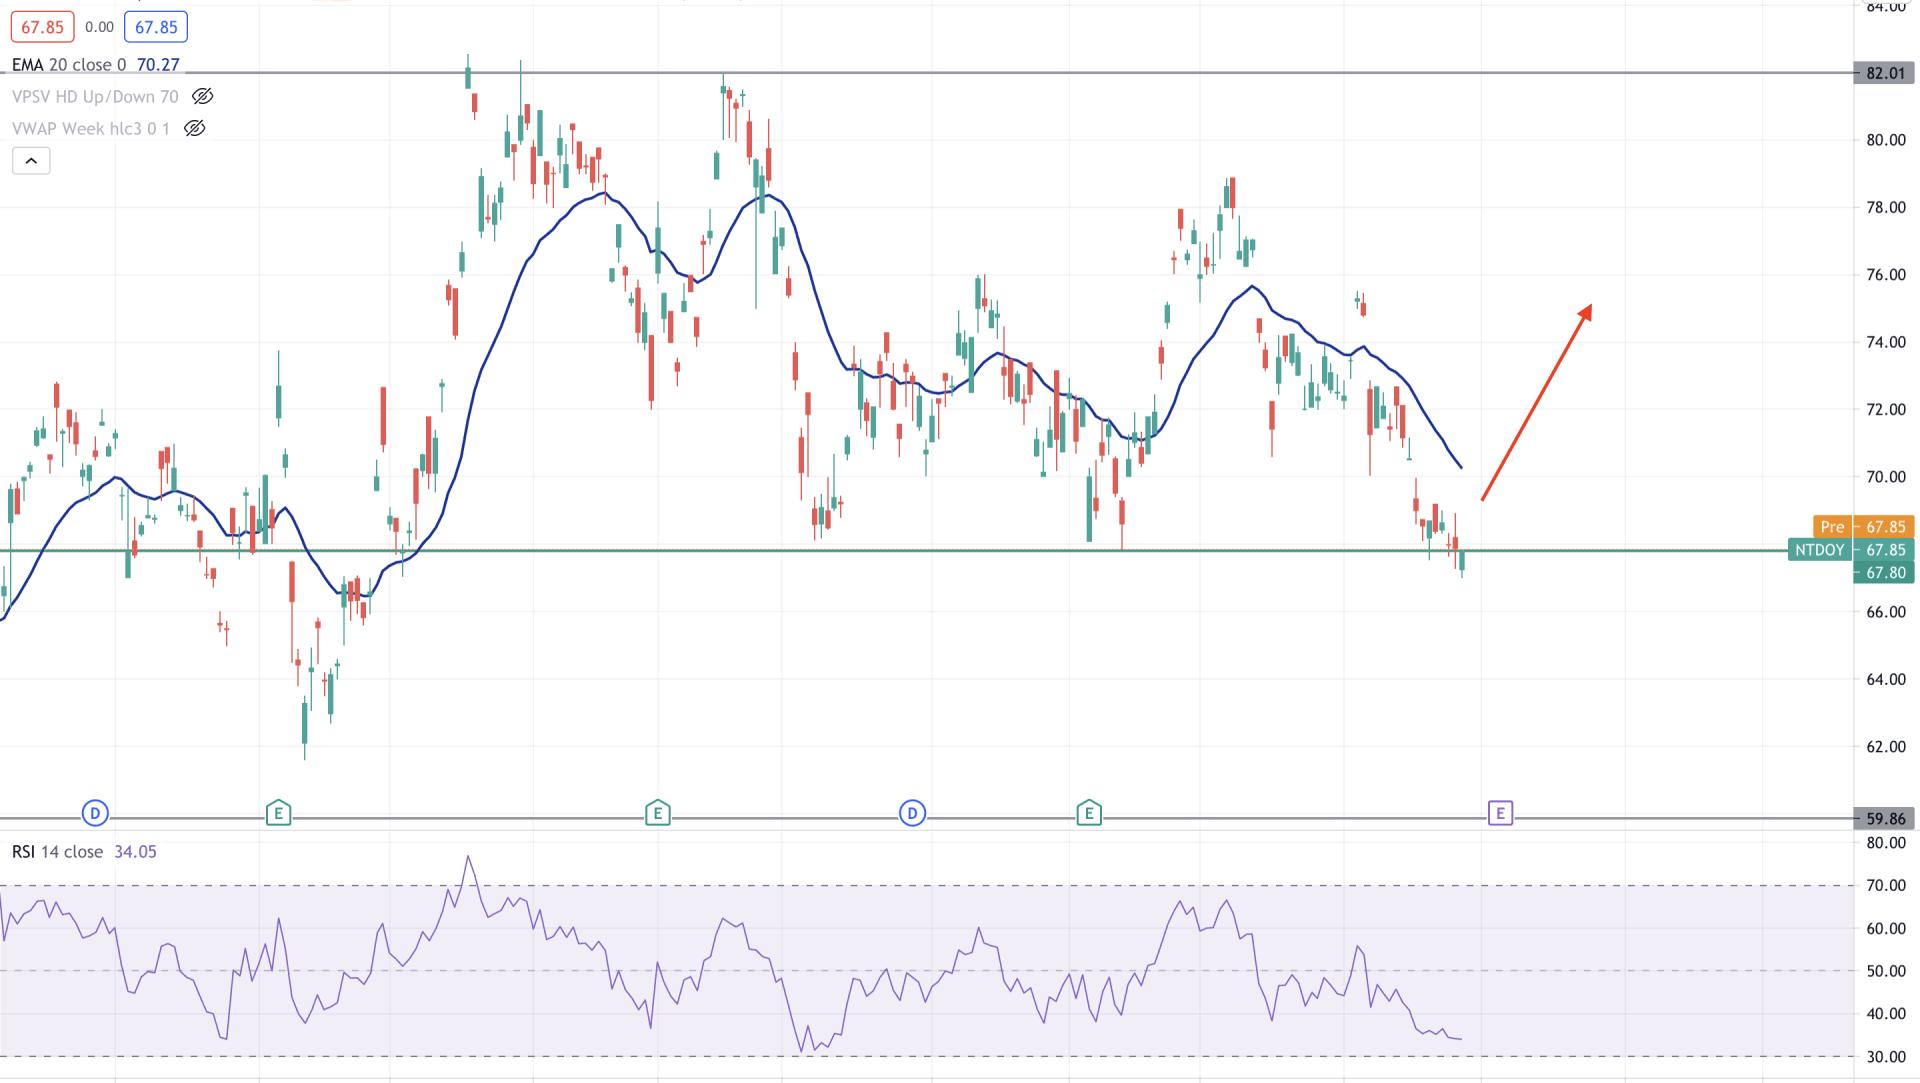 Nintendo Stock Daily Technical Analysis 29 July 2021